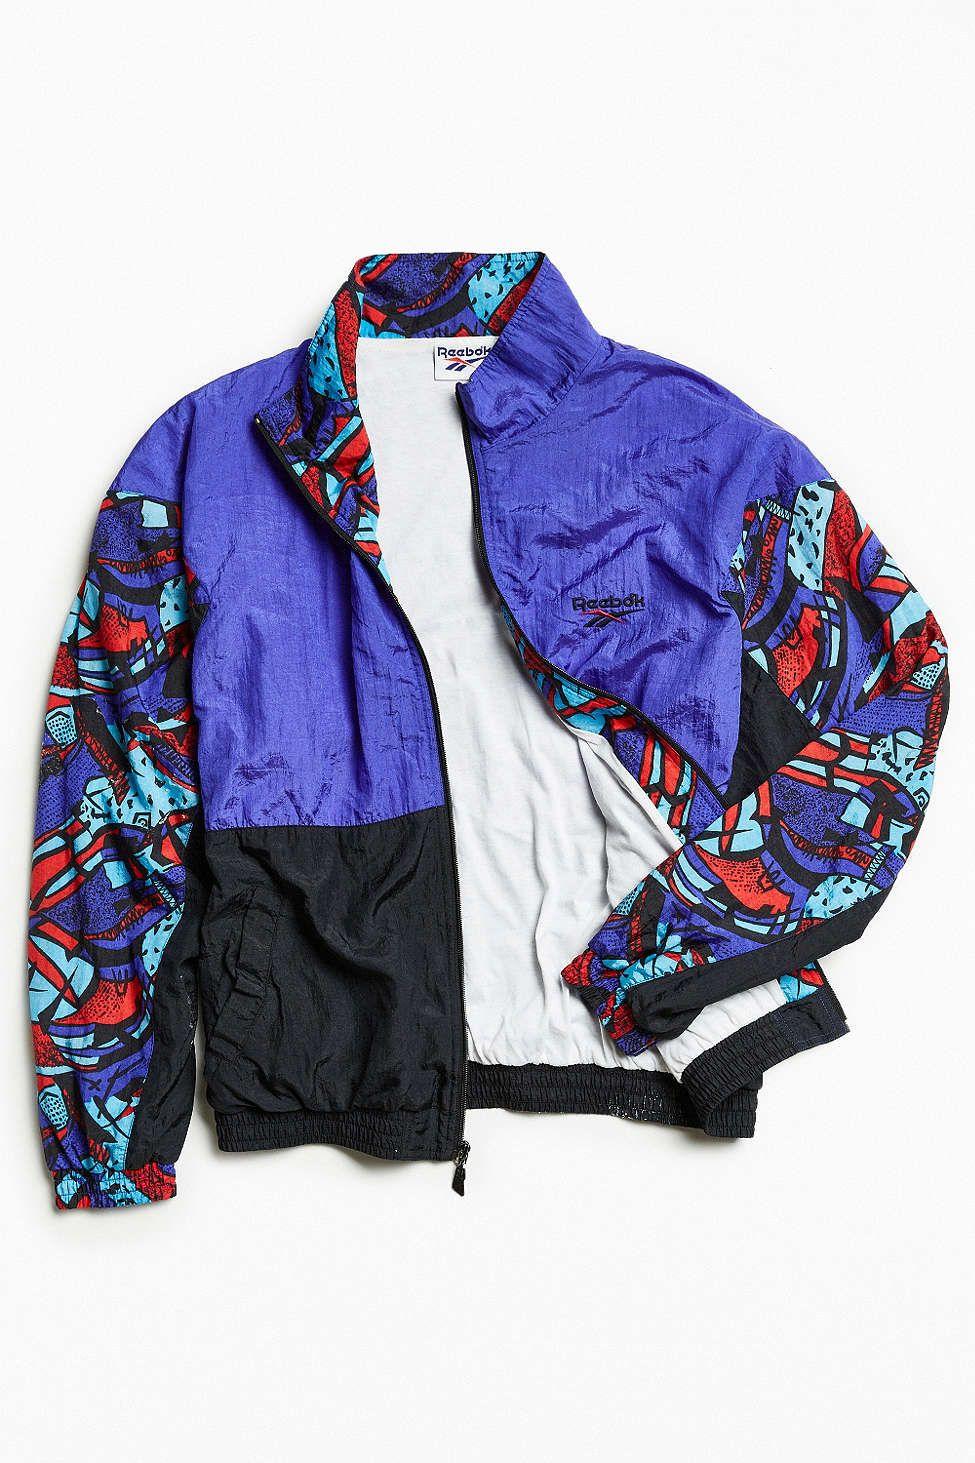 b42a777f8d3a Vintage Reebok Windbreaker Jacket